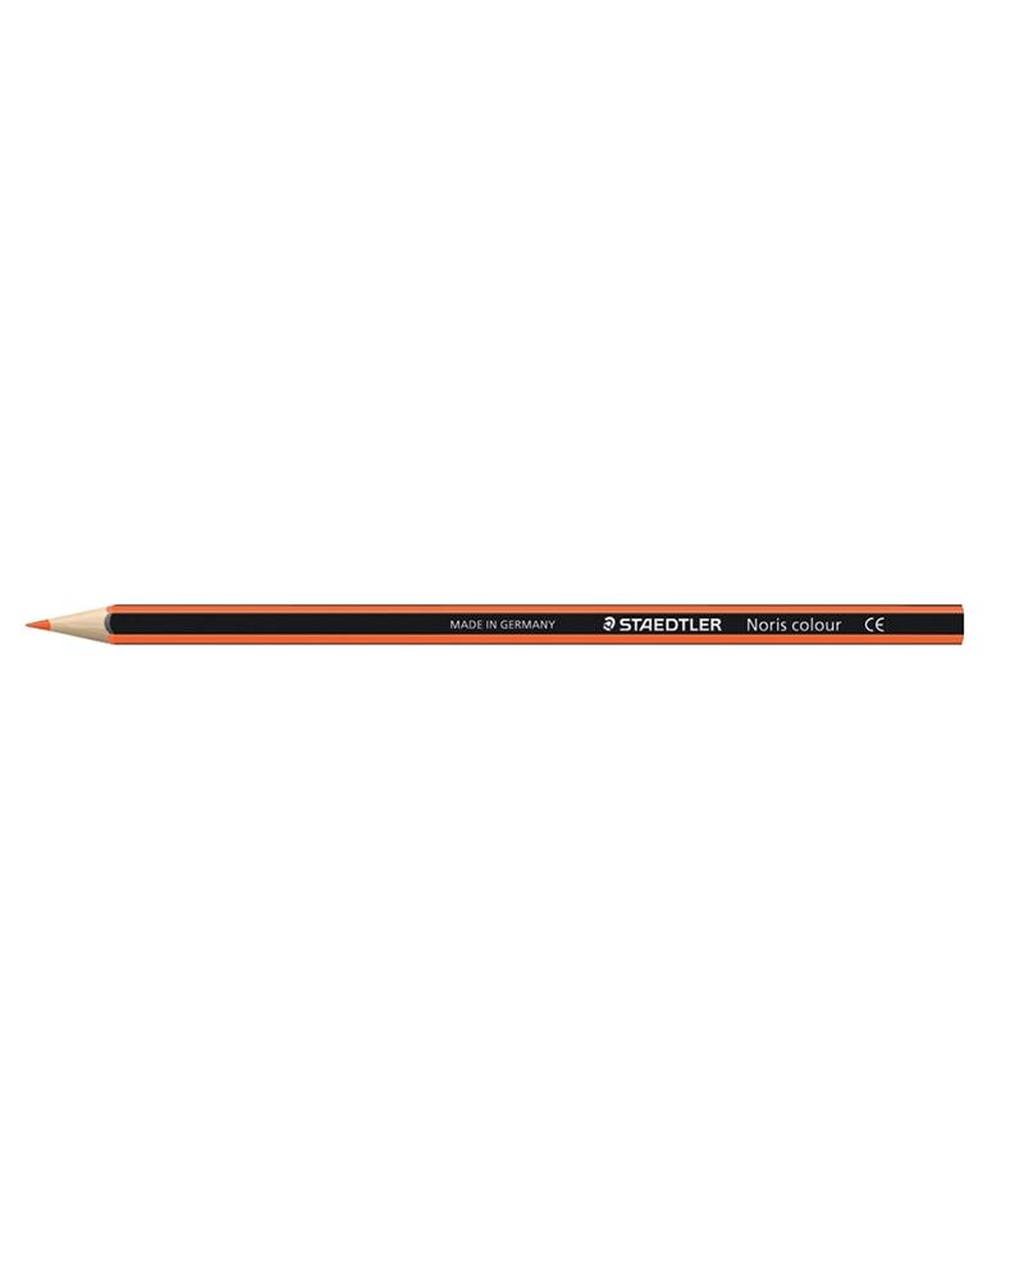 Staedtler Noris Colour Colouring Pencils - Orange